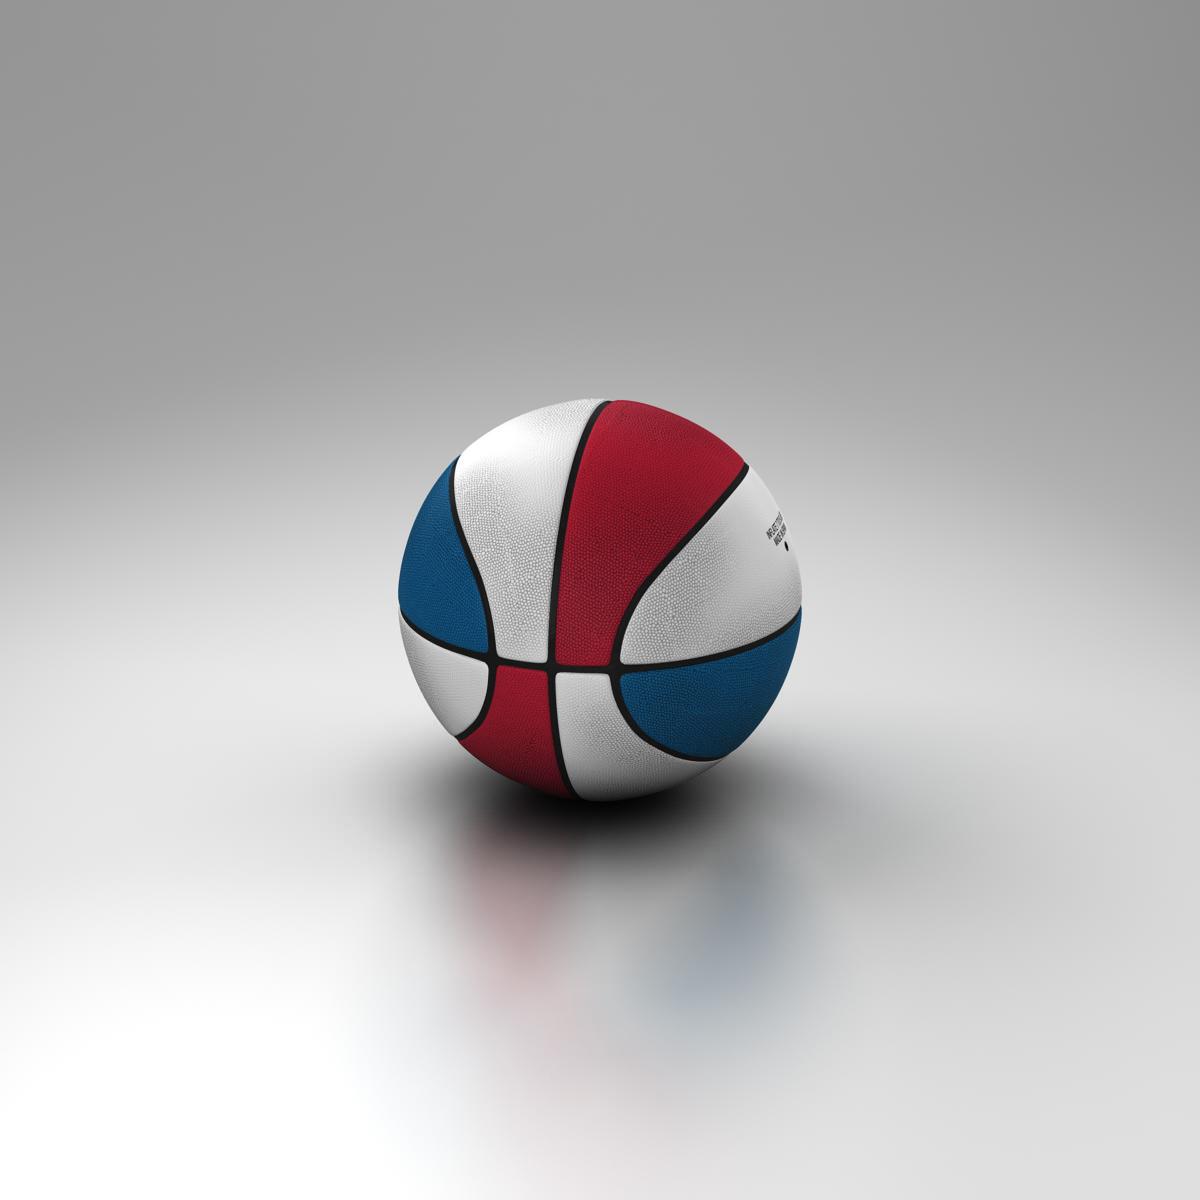 tricolor basketball ball 3d model 3ds max fbx c4d ma mb obj 164853